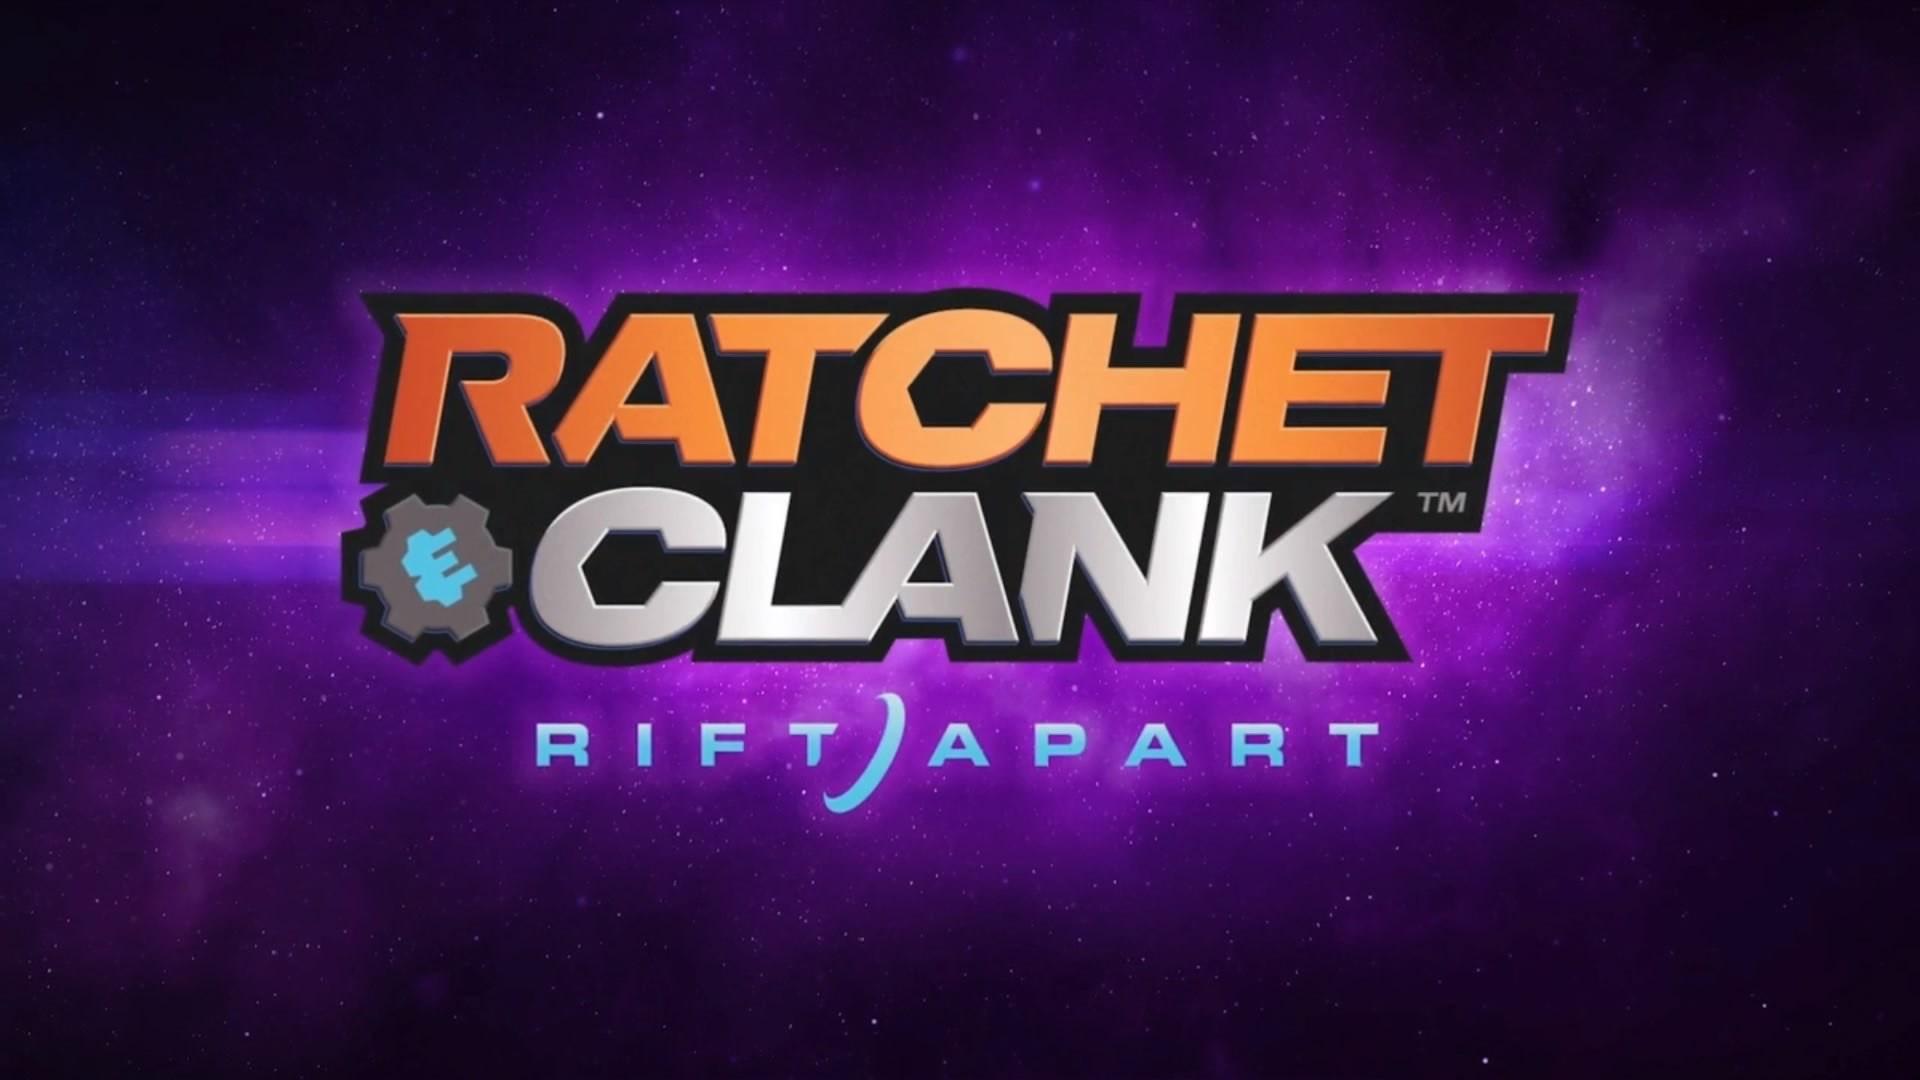 Ratchet & Clank: A Rift Apart - PS5 - Wallpapers - 1920x1080